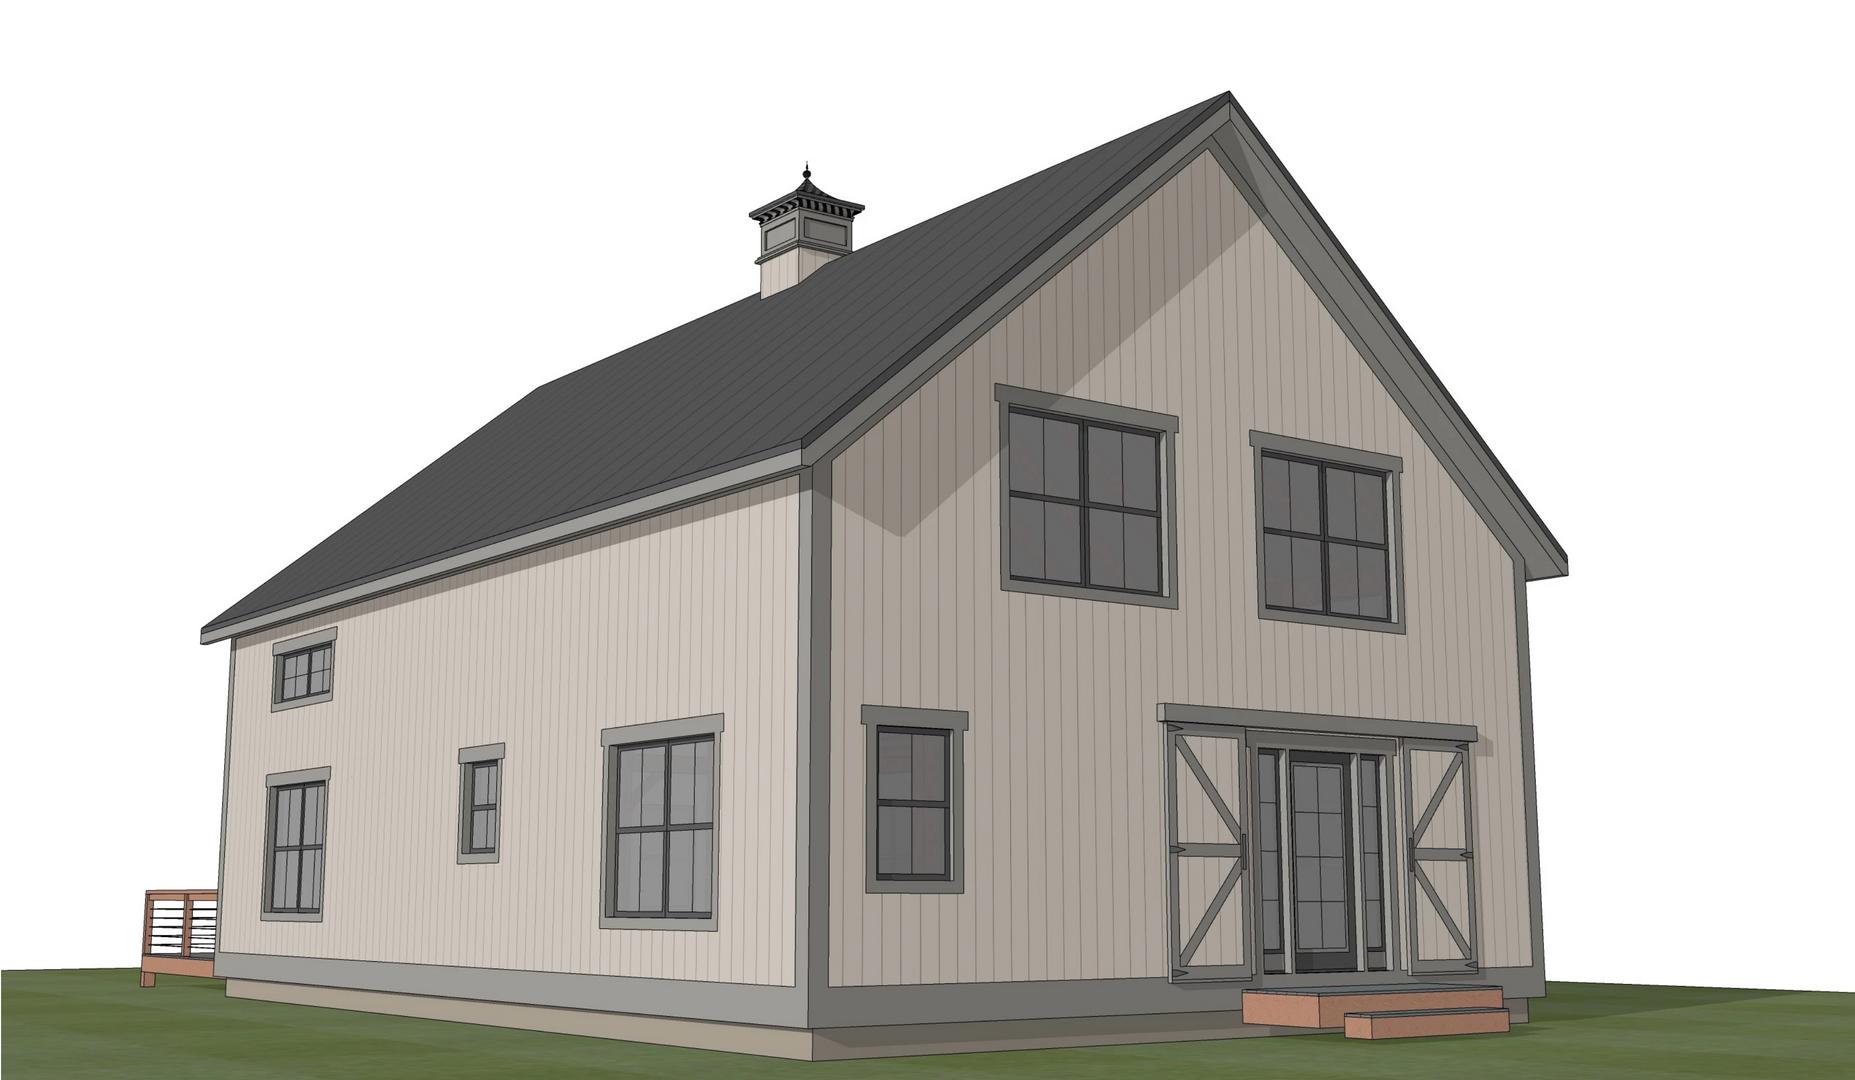 Stratton barn home exterior